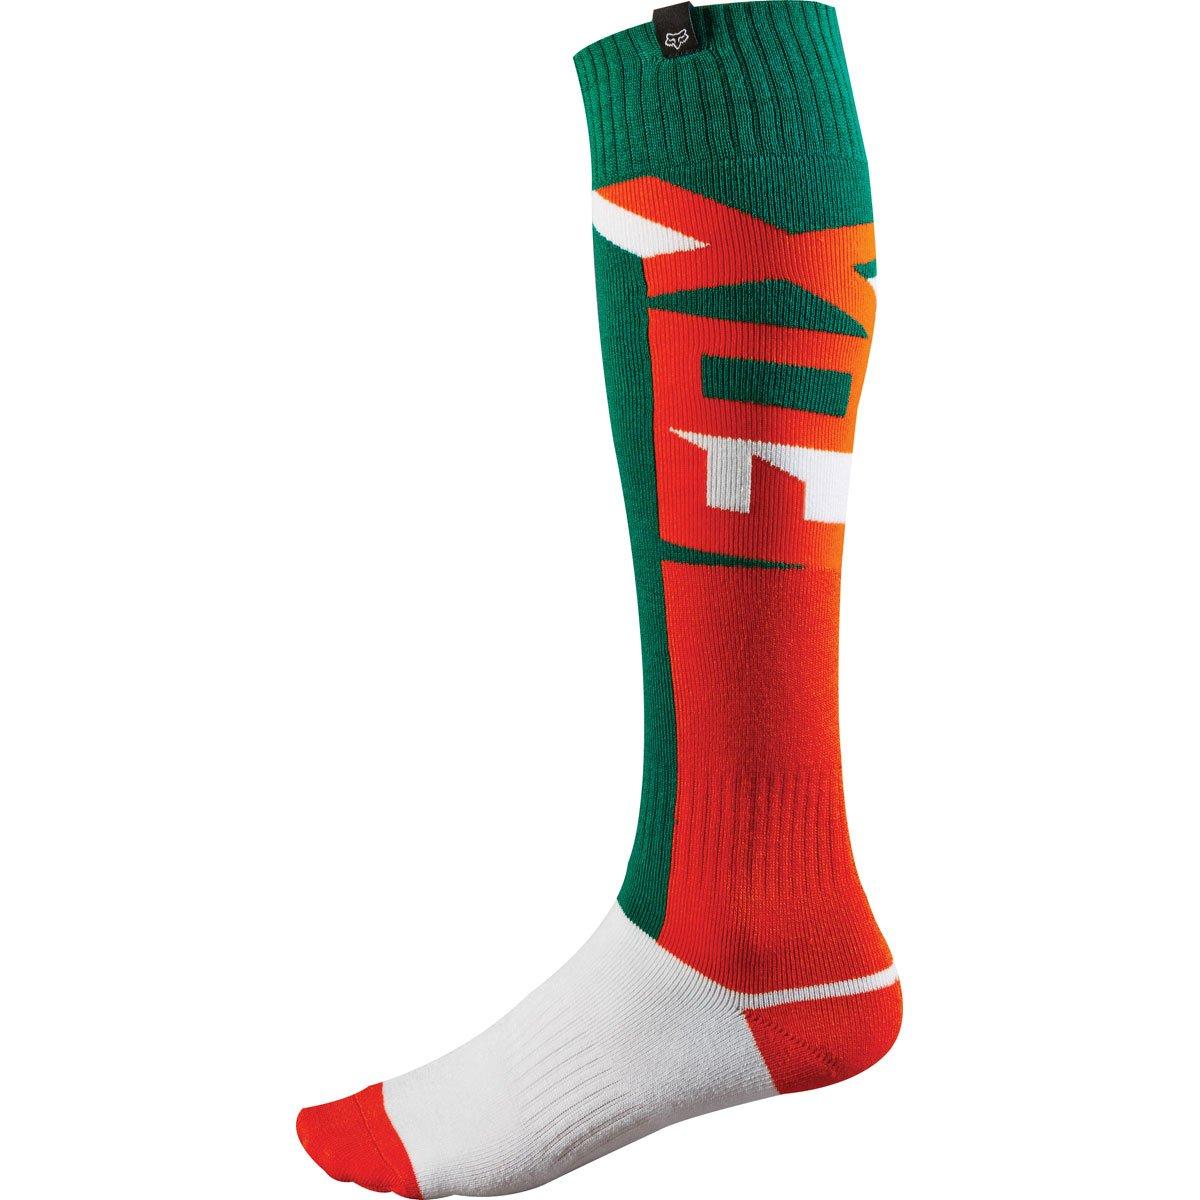 Fox Racing Fri Thin Vandal Men's Motocross Motorcycle Socks - Green/Orange / Small